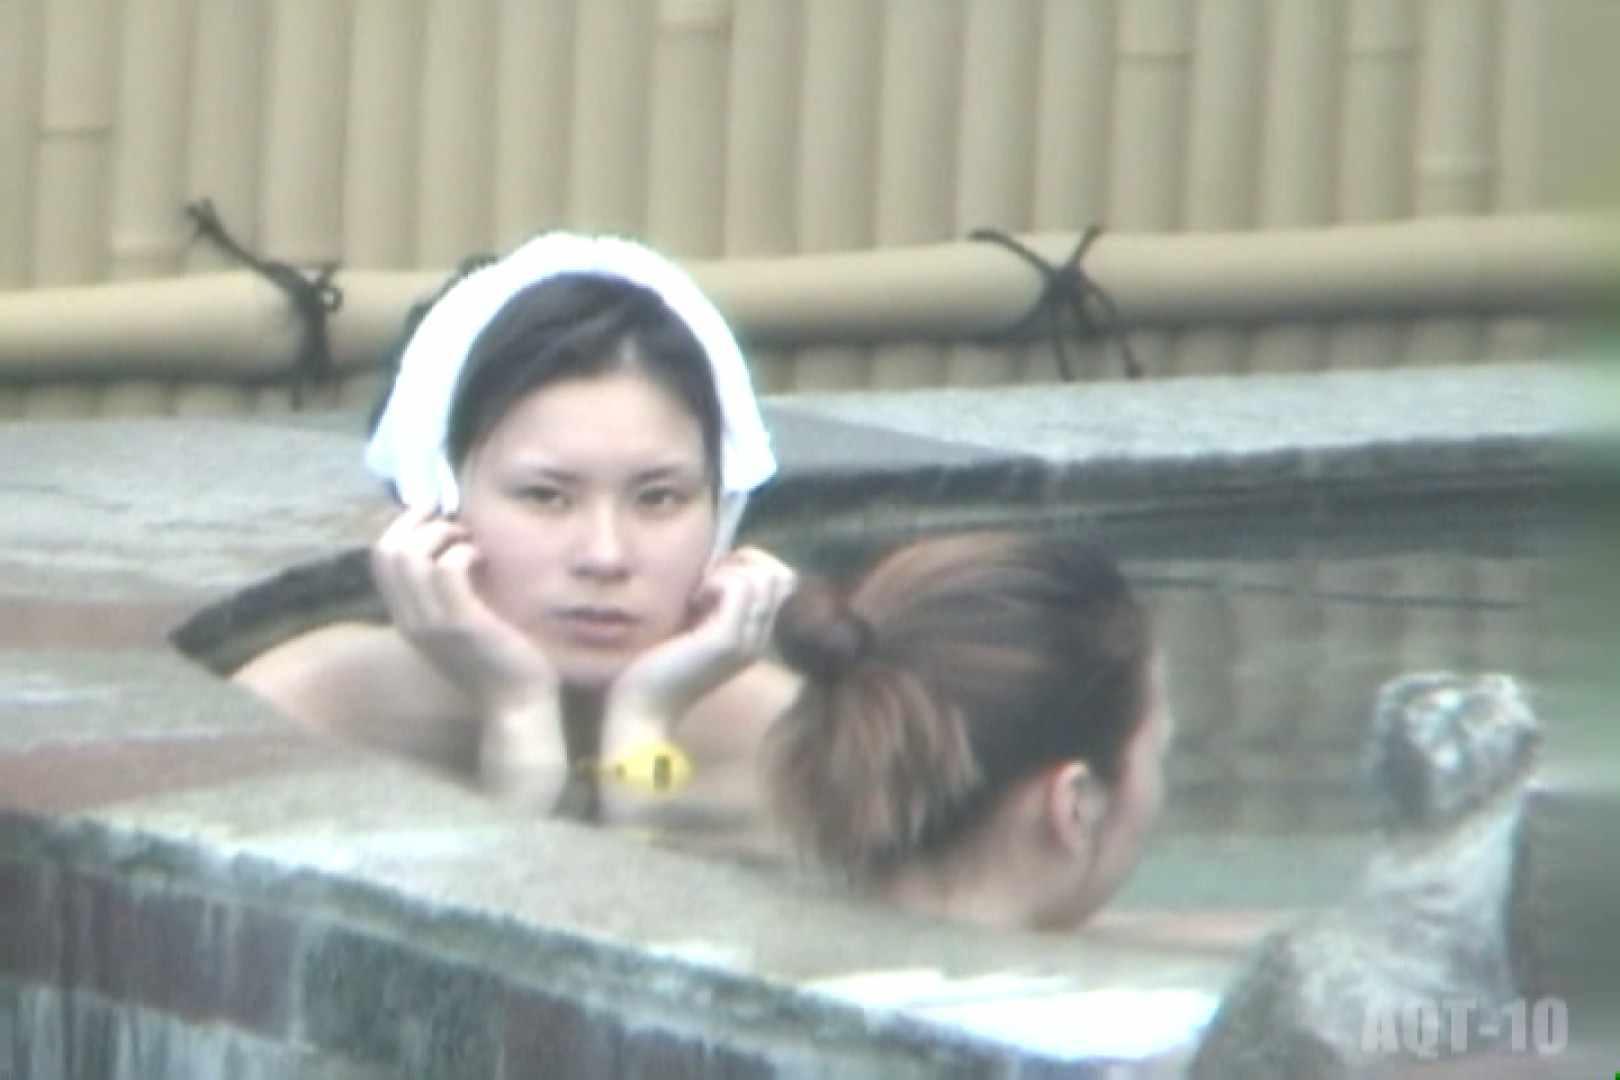 Aquaな露天風呂Vol.792 盗撮   HなOL  103pic 46